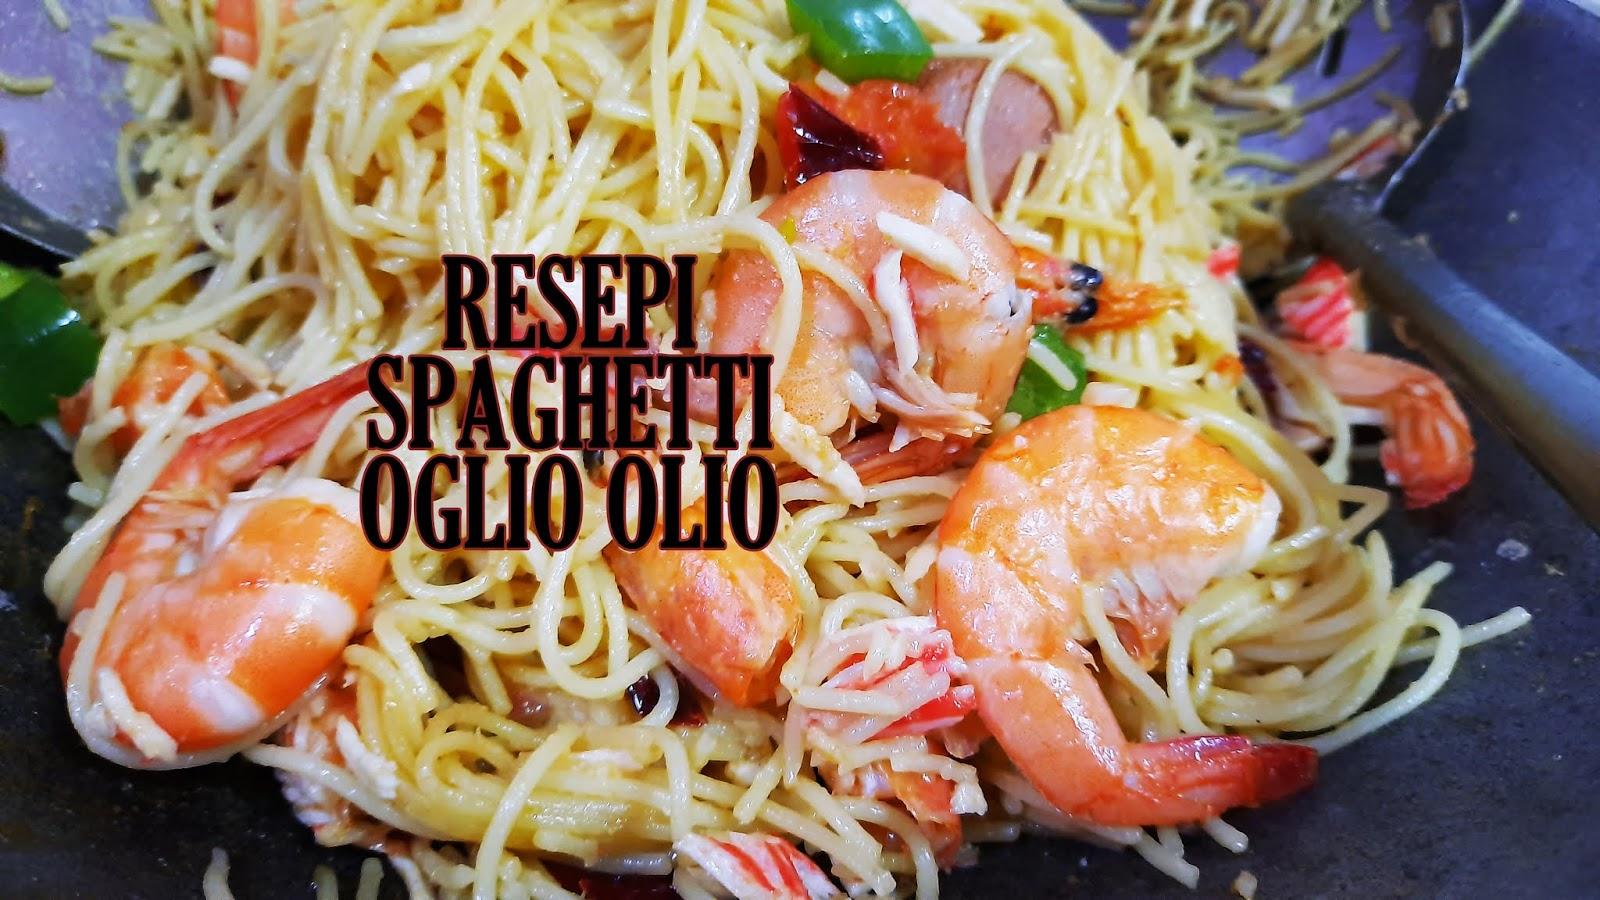 resepi spaghetti oglio olio mudah  cepat shalimar yusof Resepi Pasta Angel Hair Enak dan Mudah